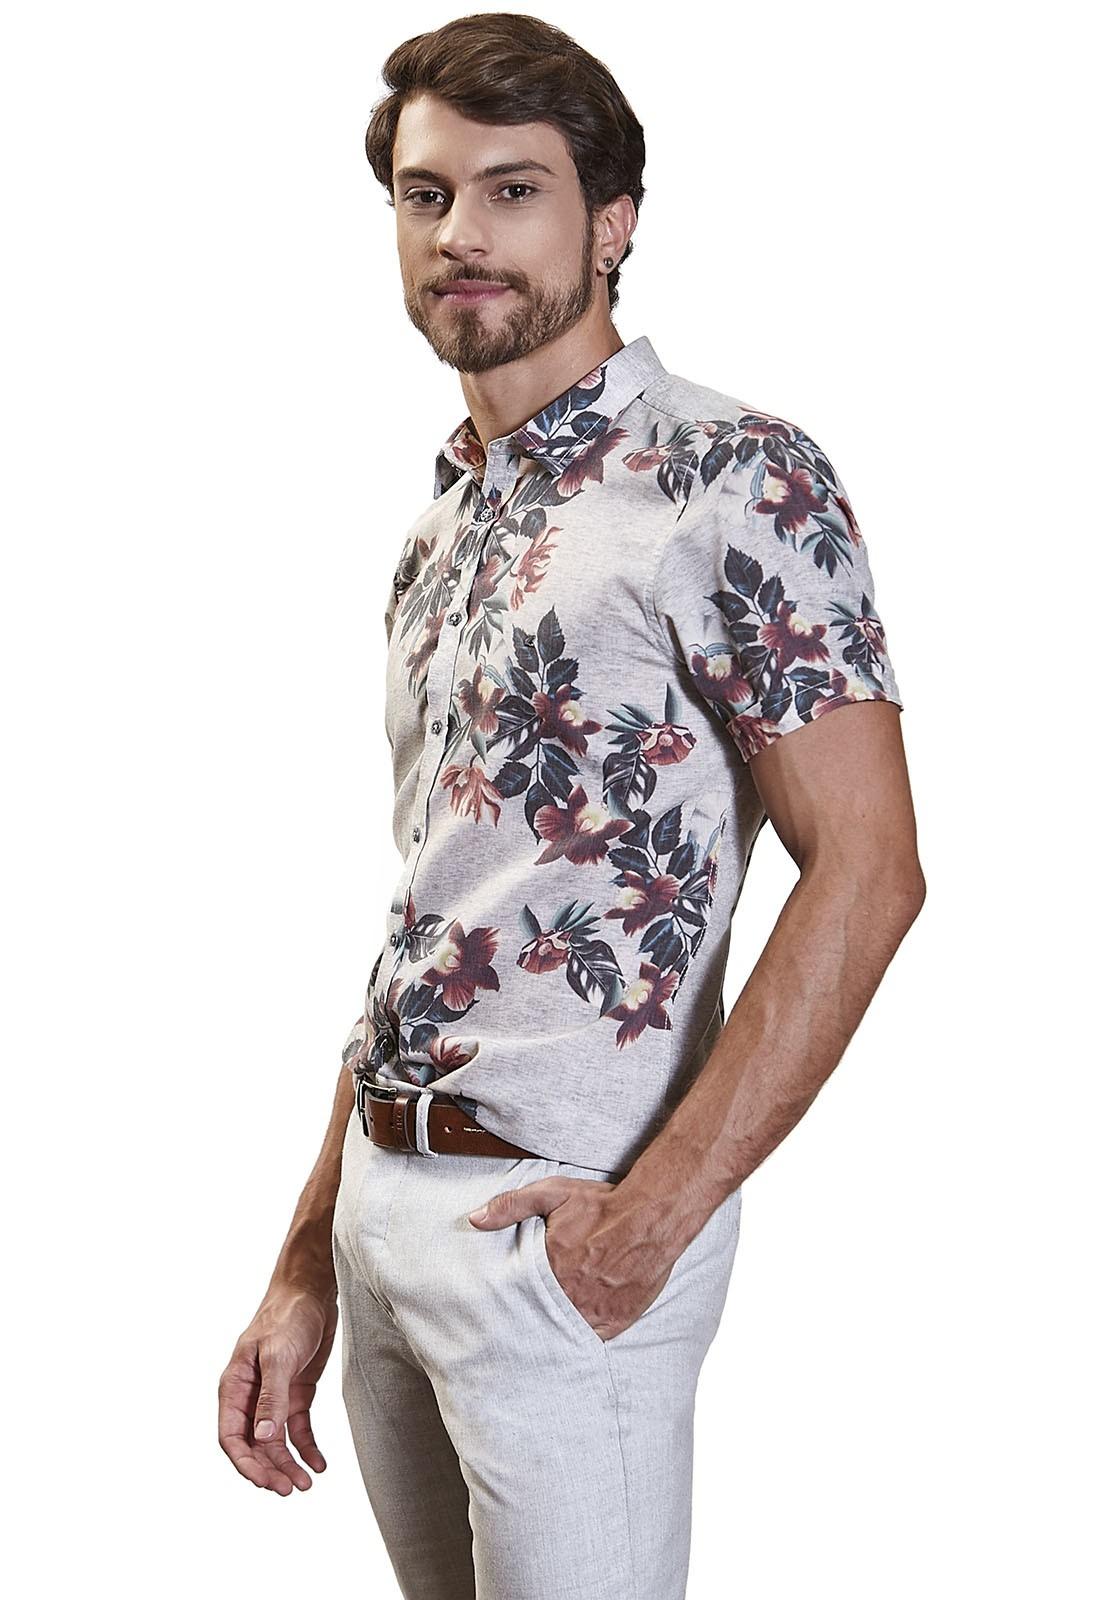 Camisa Slim Zaiko Estampada Floral Manga Curta 2257 Branca